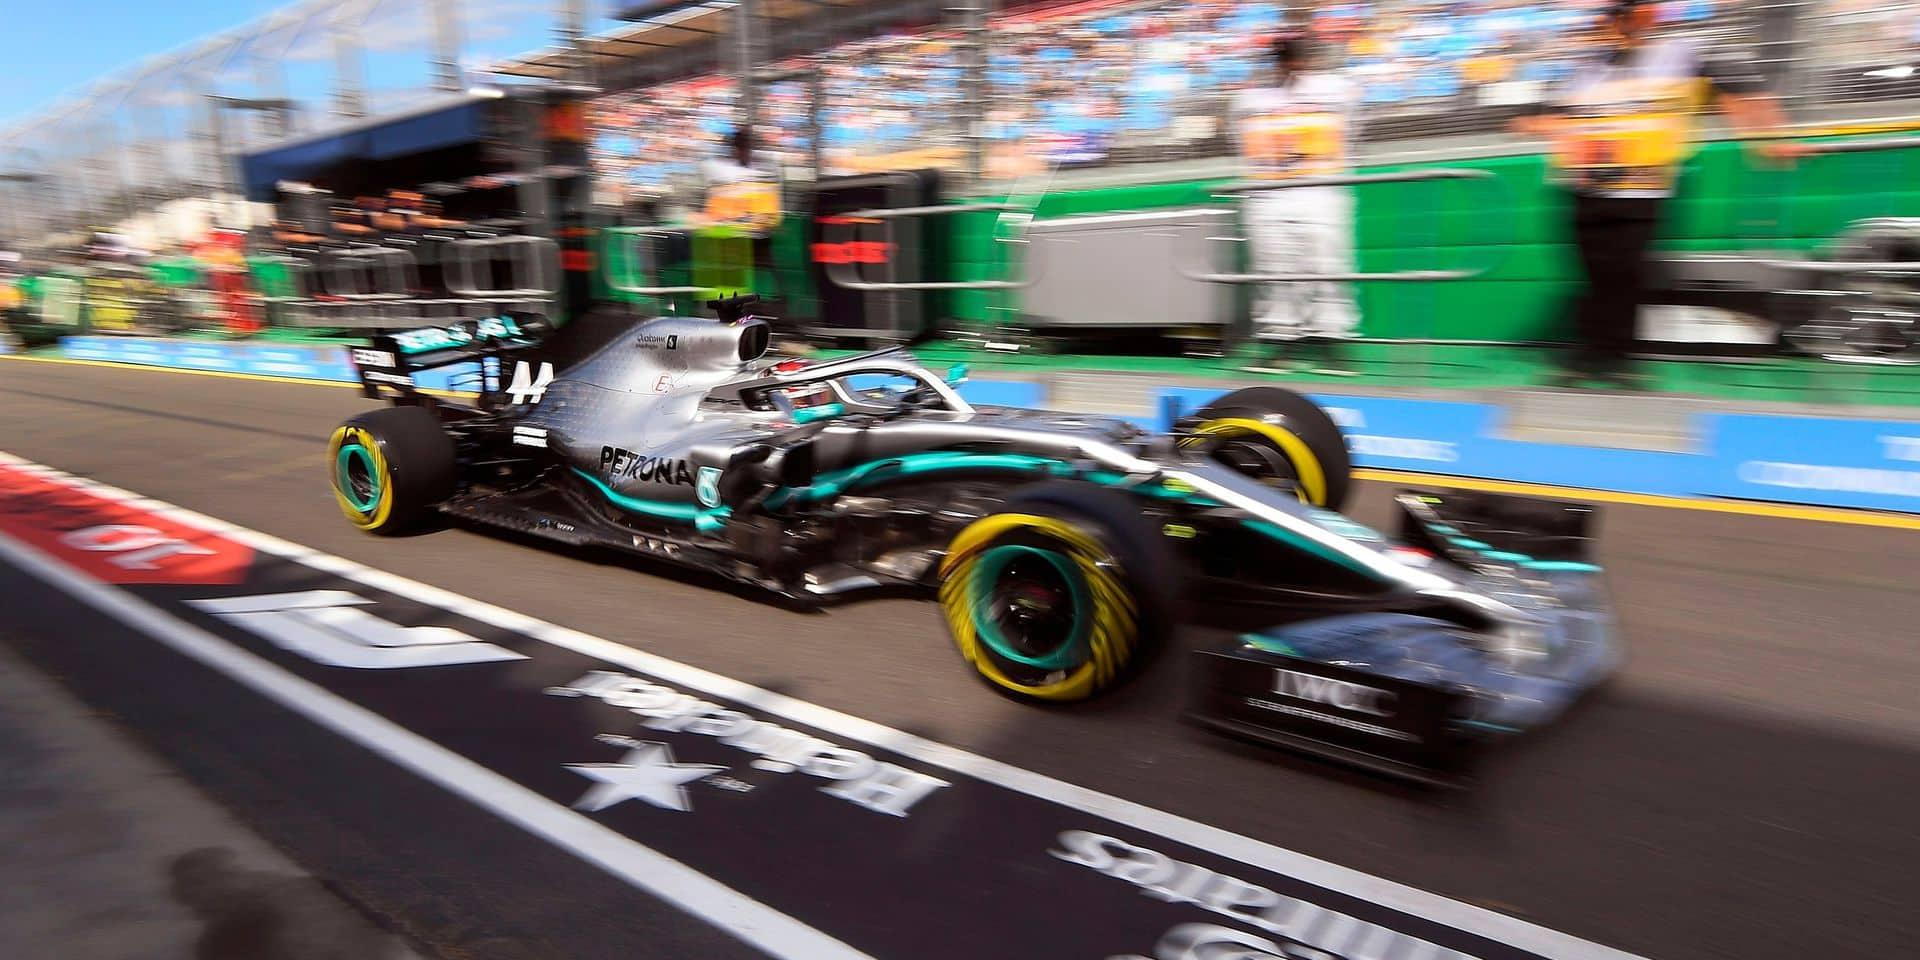 Mercedes loin devant Red Bull, Ferrari cache son jeu